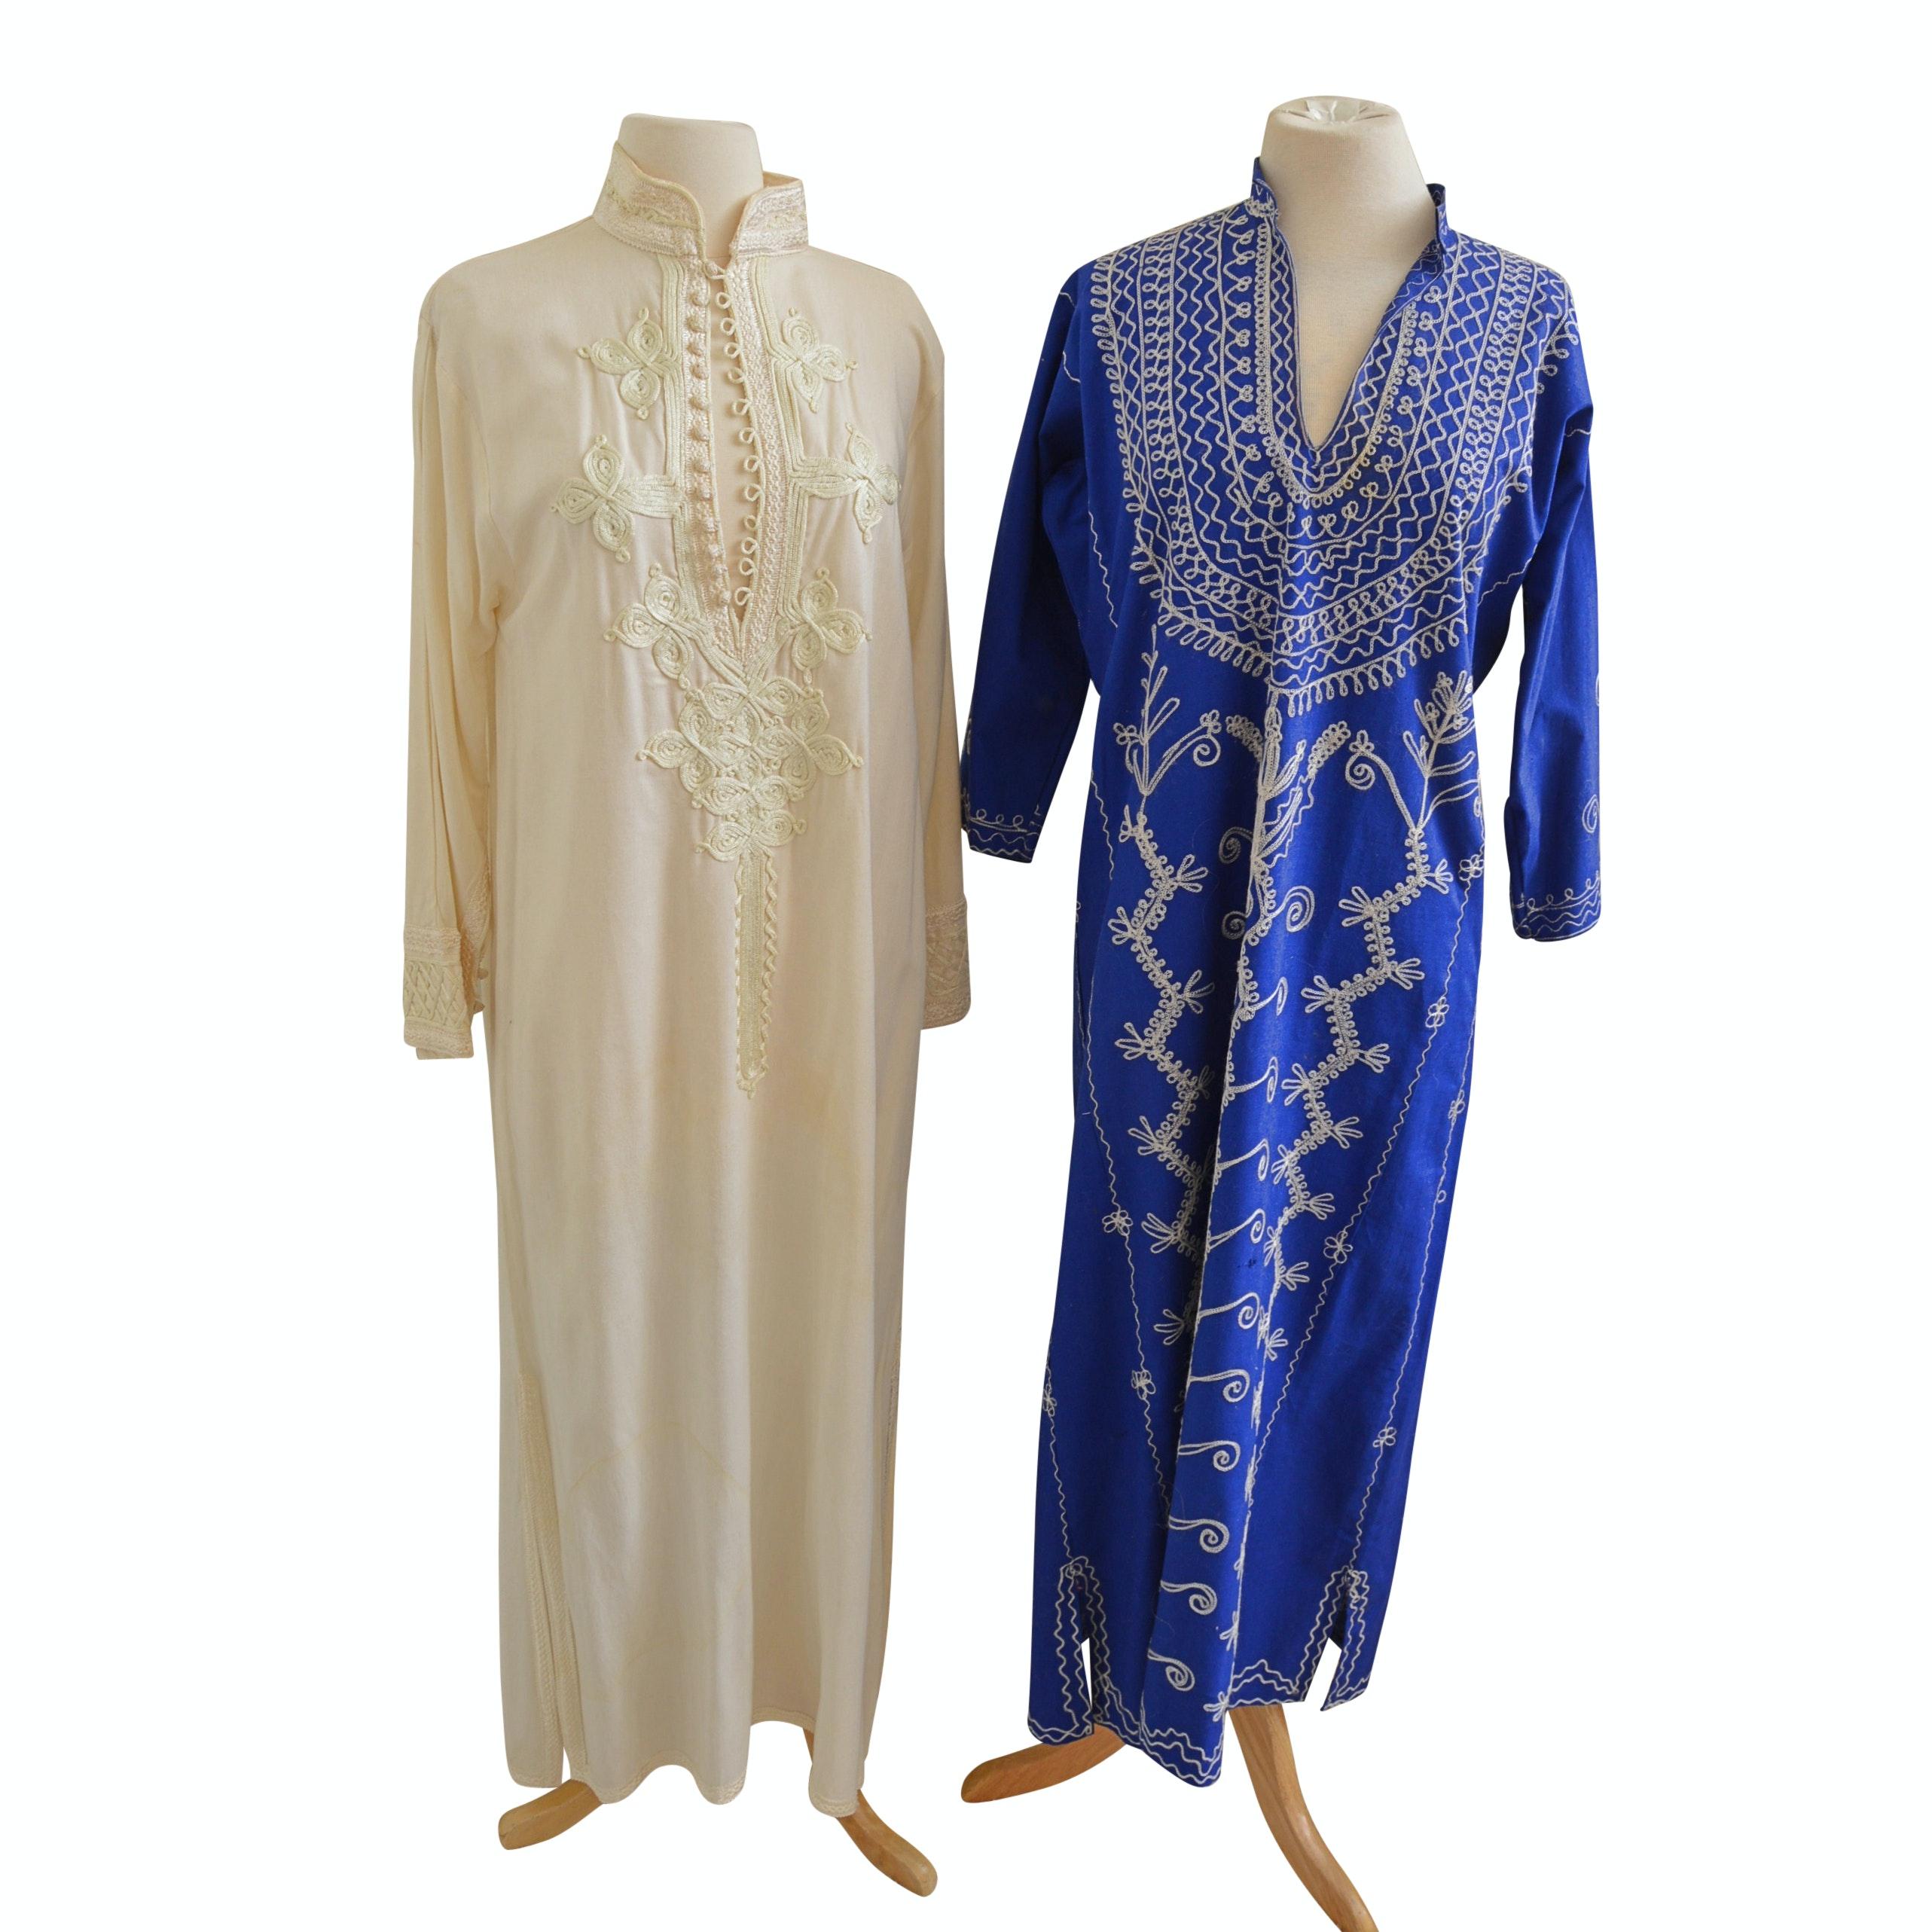 1970s Vintage Saks Morocco Caftan and Embroidered Blue Caftan